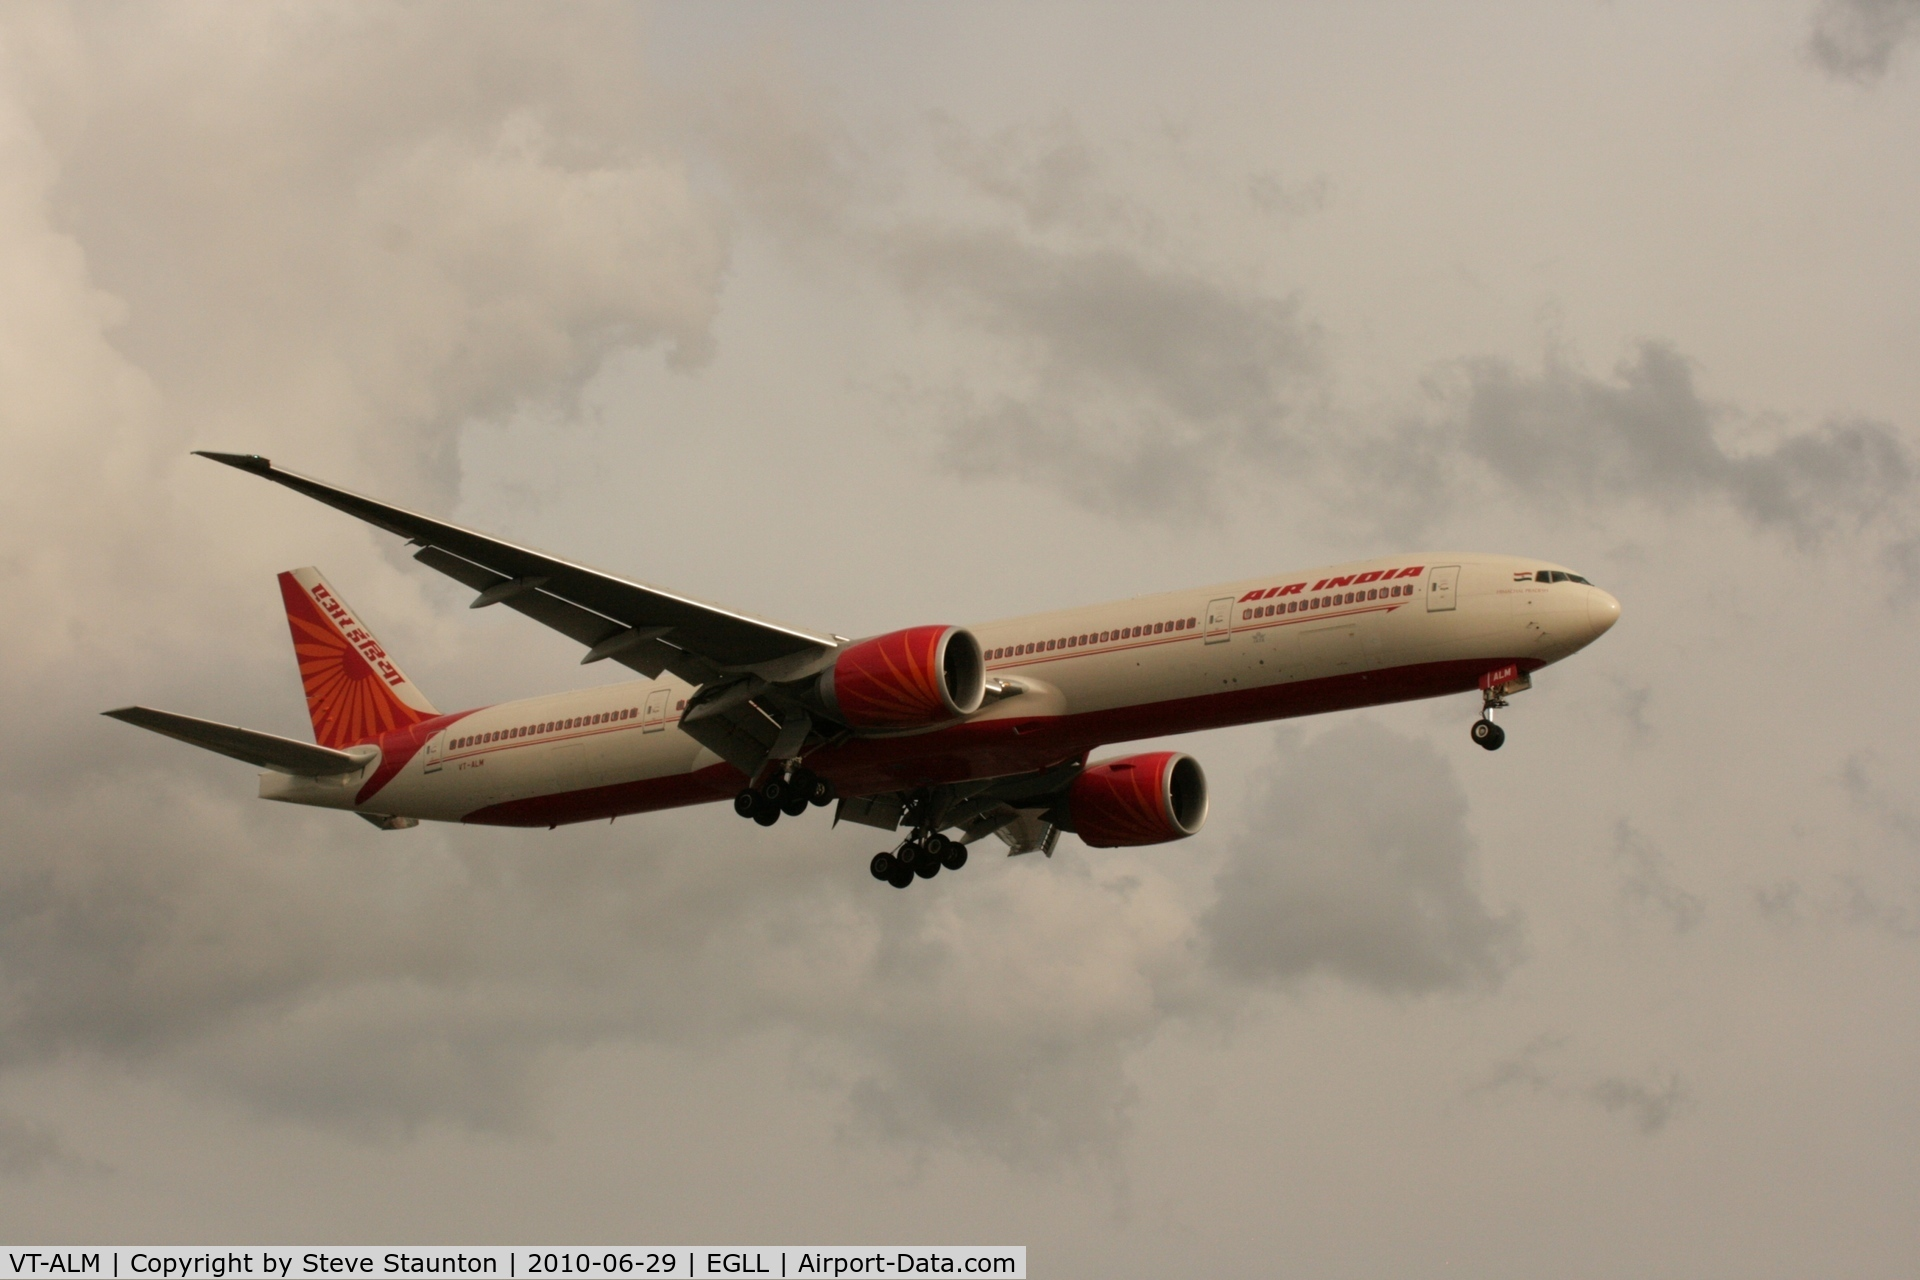 VT-ALM, 2008 Boeing 777-337/ER C/N 36311, Taken at Heathrow Airport, June 2010